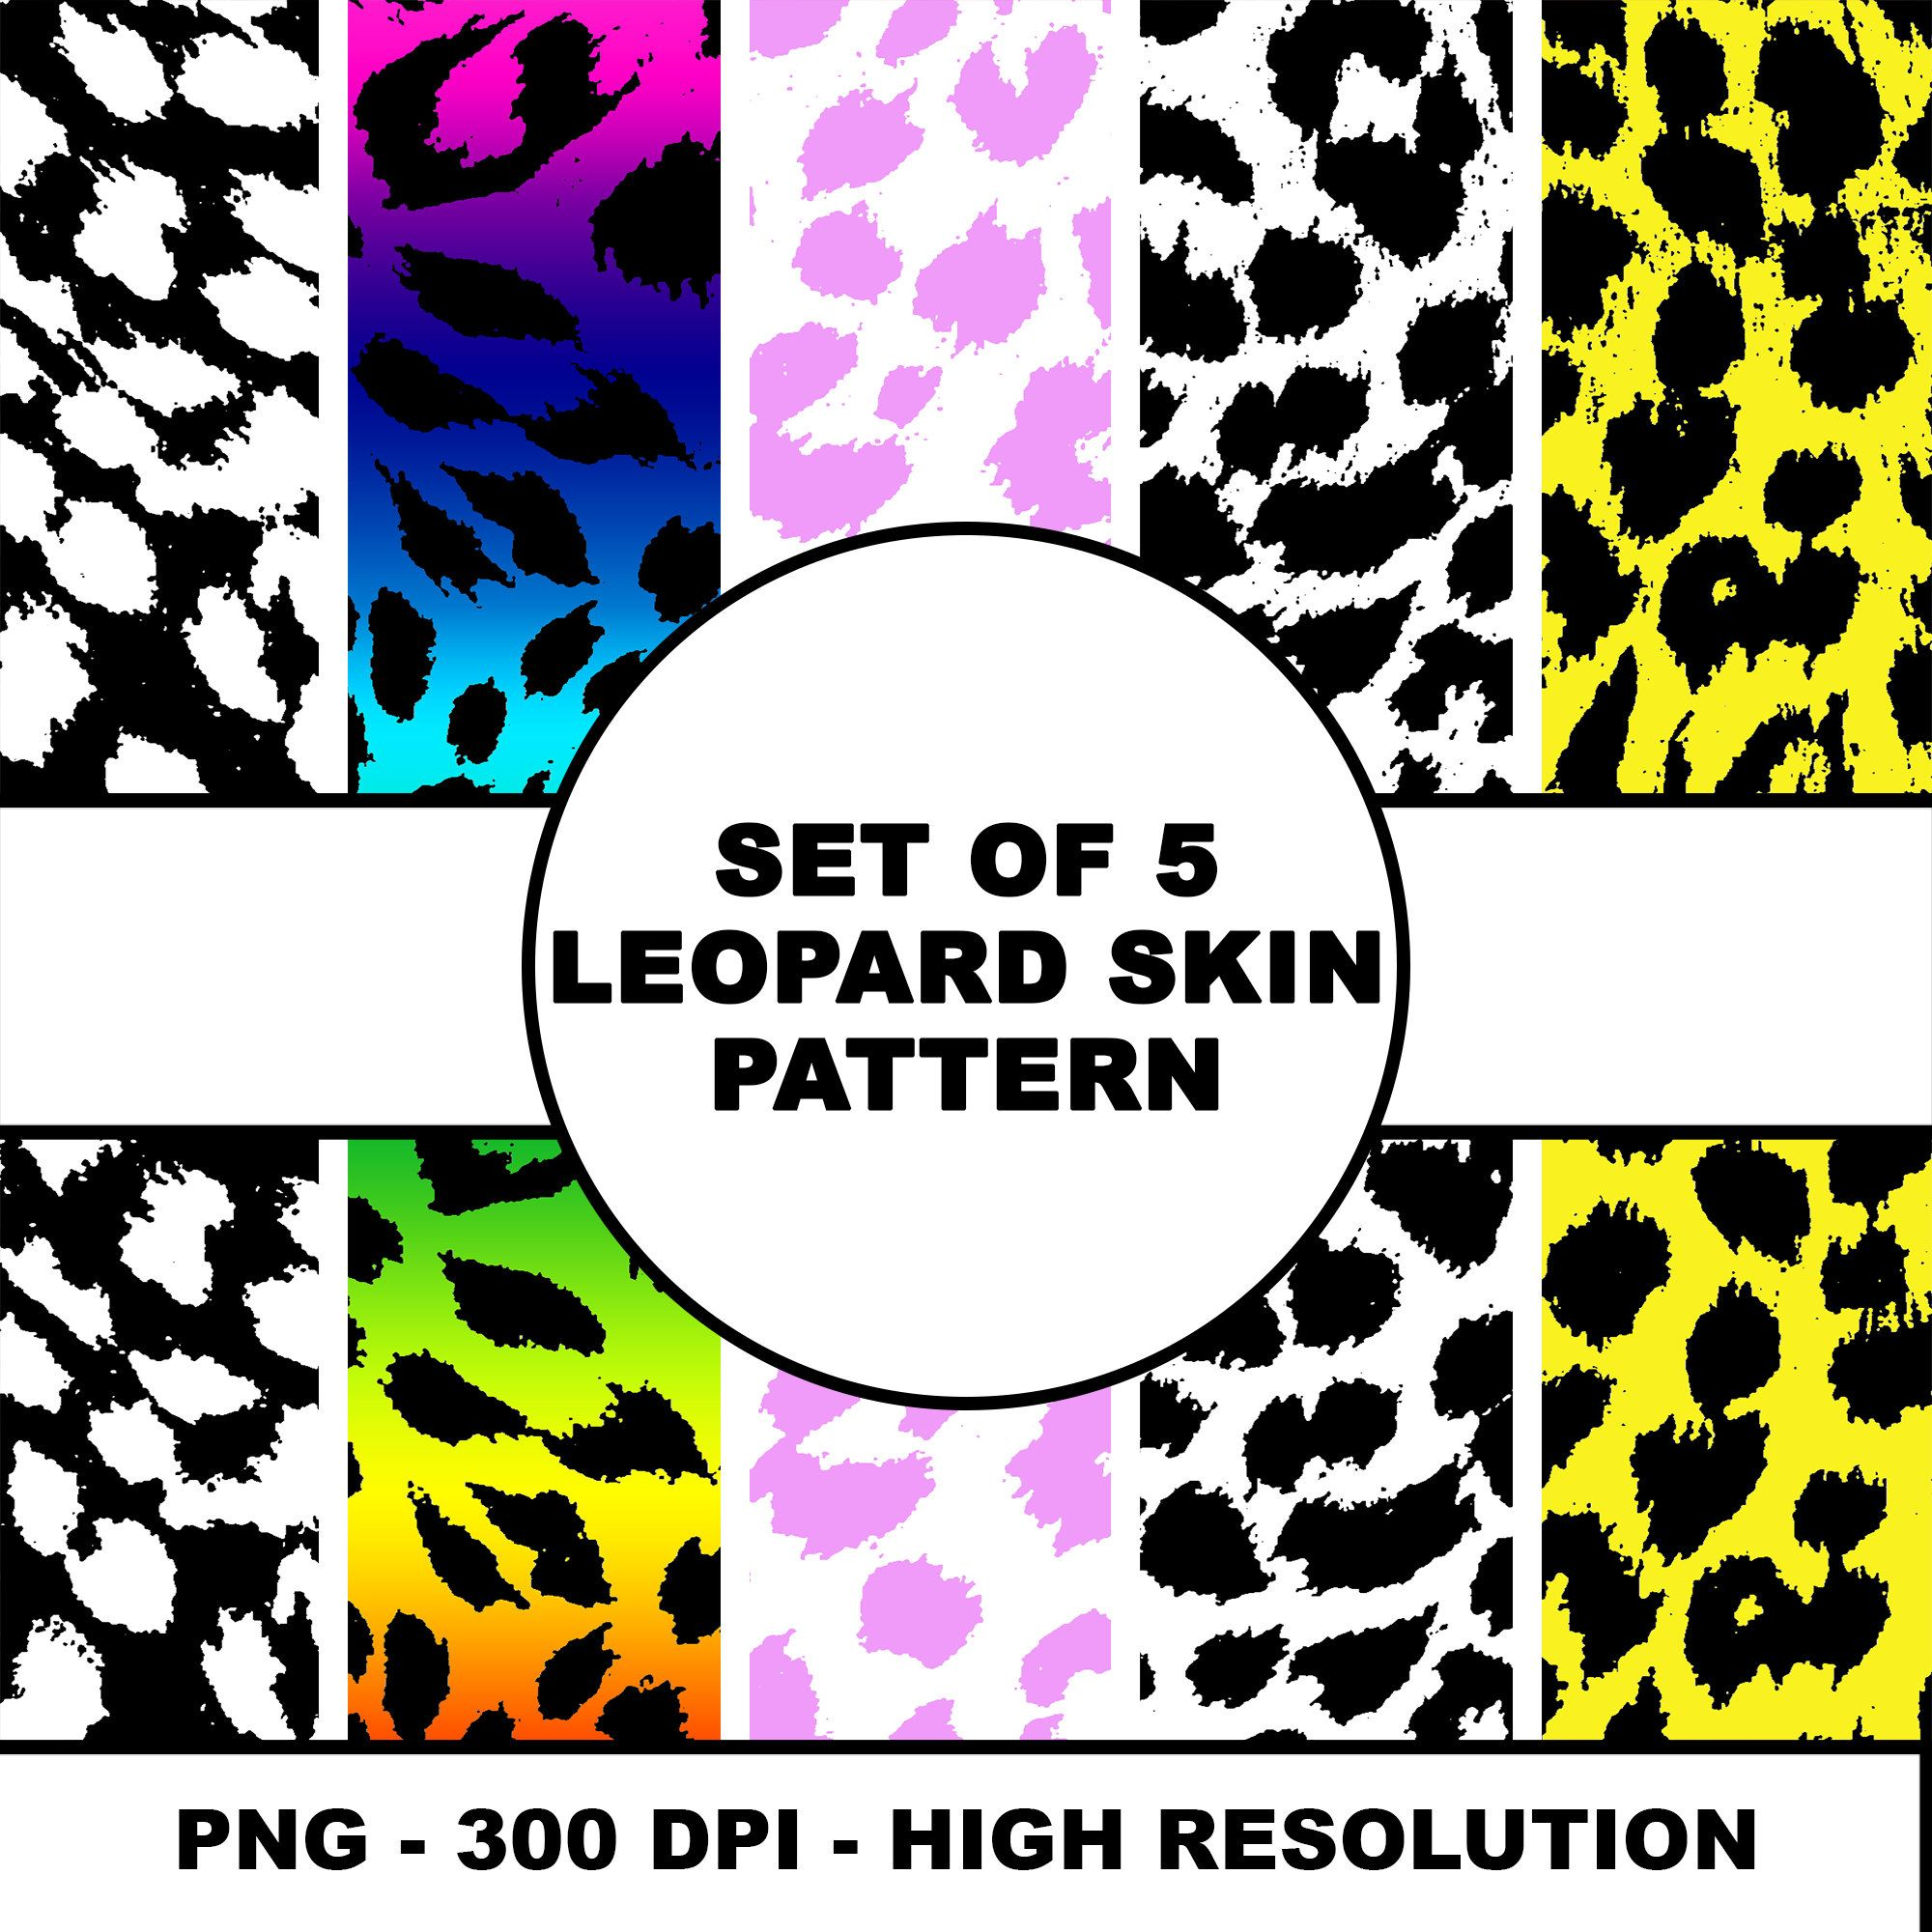 5 Leopard Skin Texture Animal Pattern Artwork 5 Different Etsy Skin Textures Digital Art Prints Animal Pattern